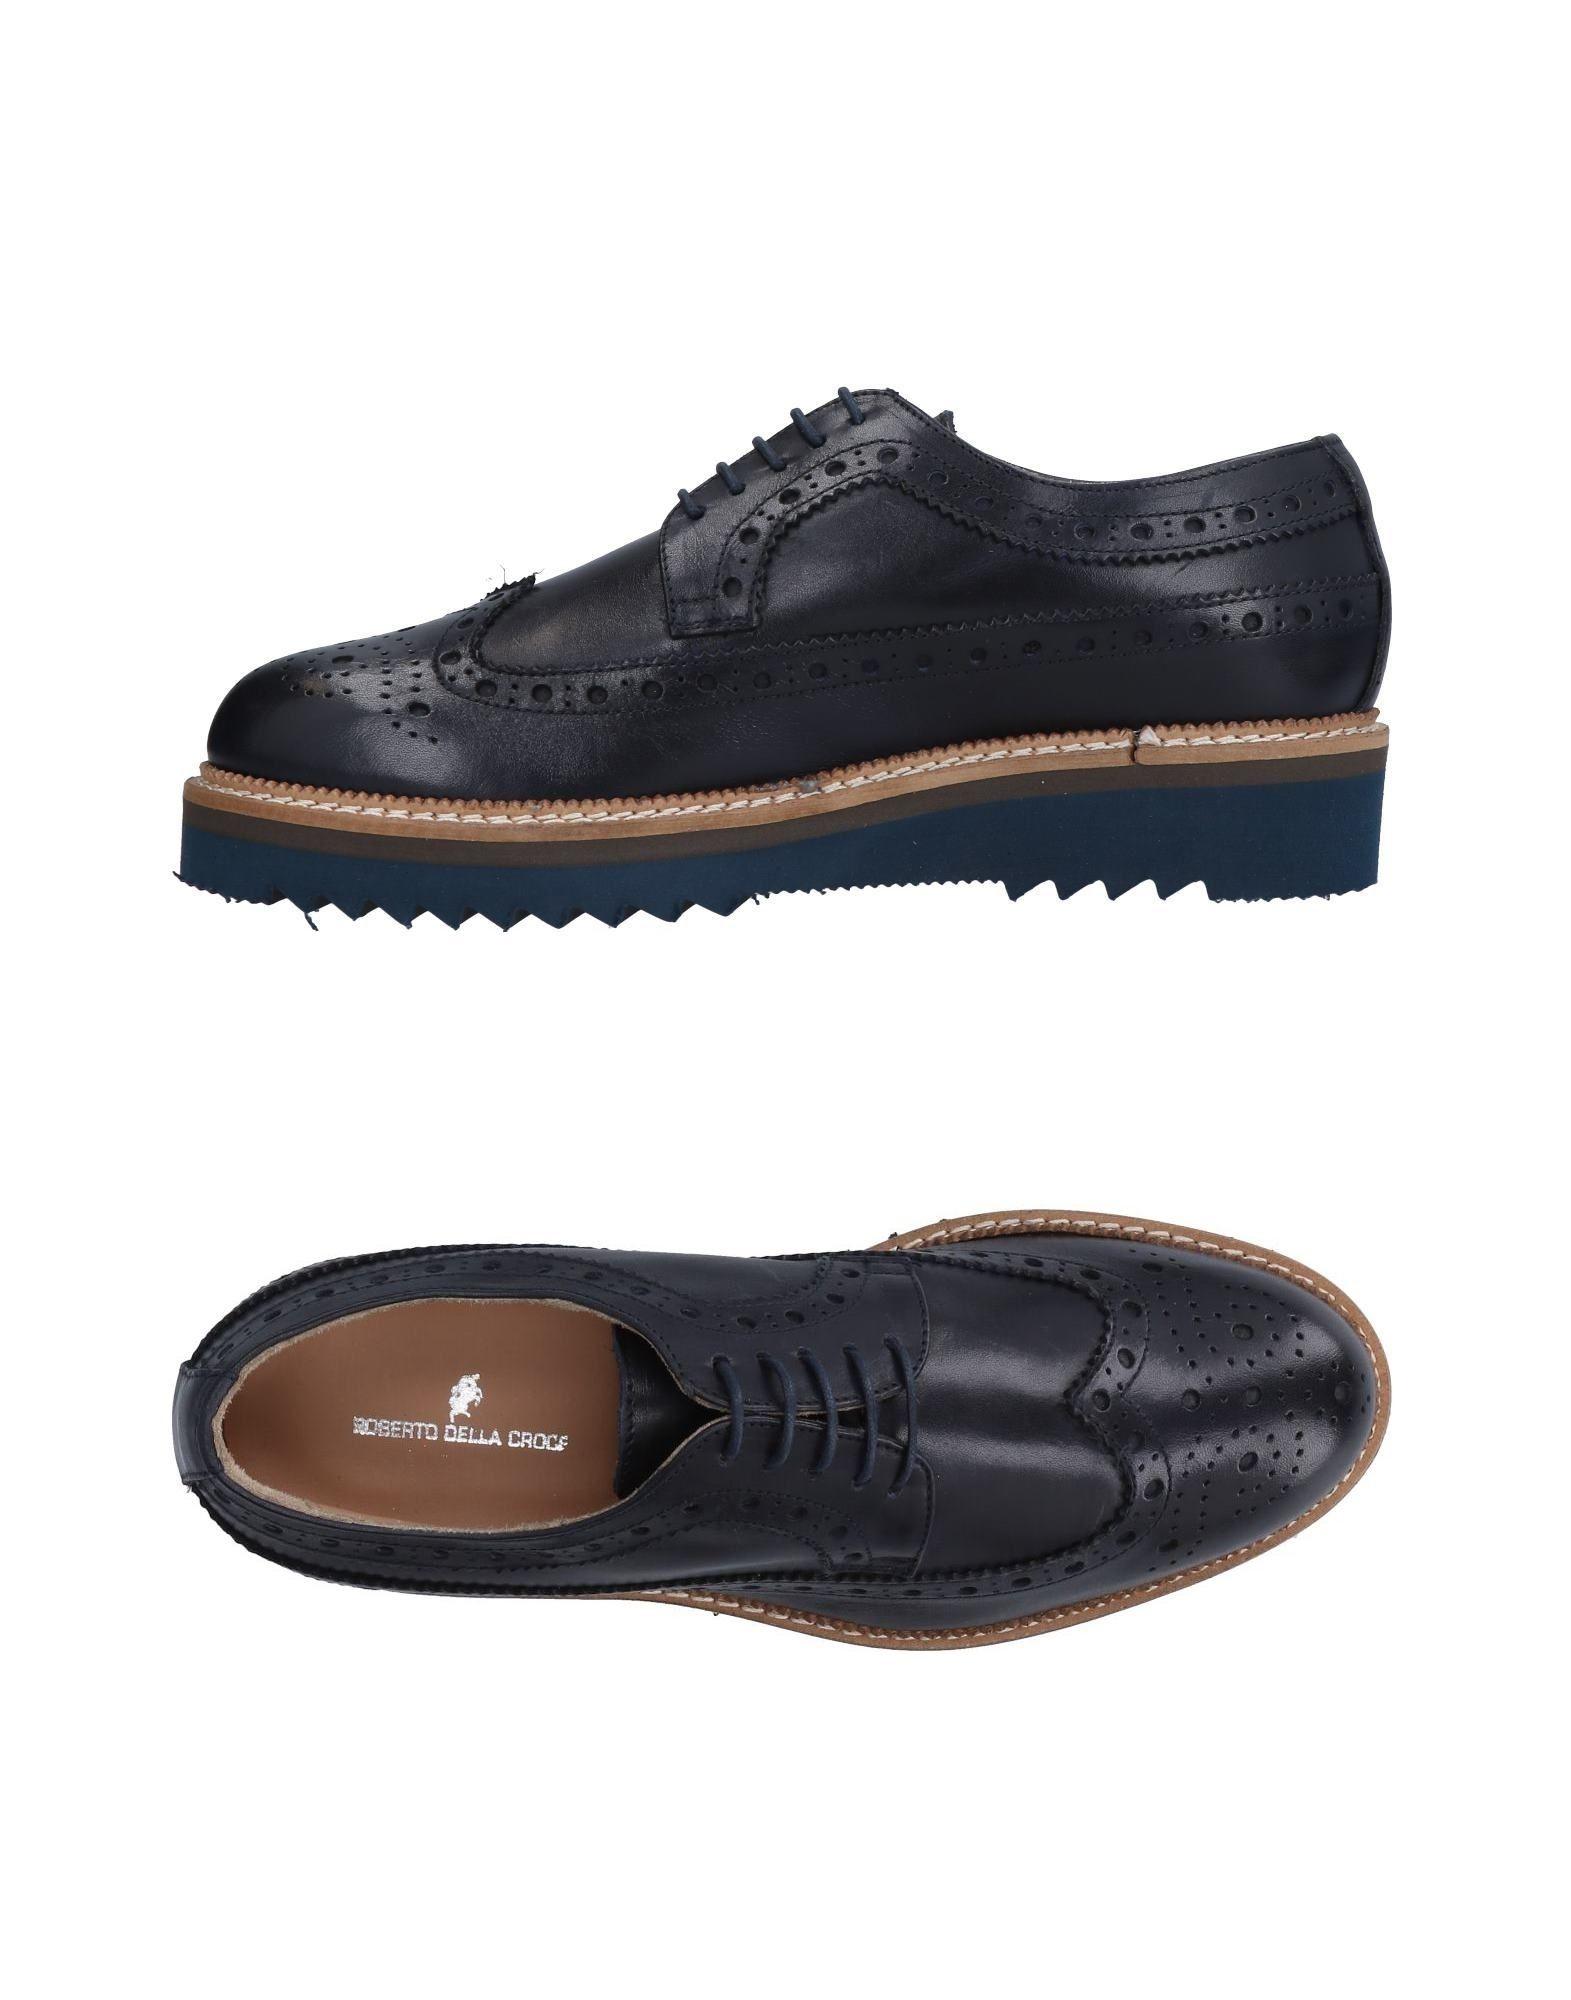 Rabatt echte Schuhe Roberto Della Croce Schnürschuhe Herren  11504696DC